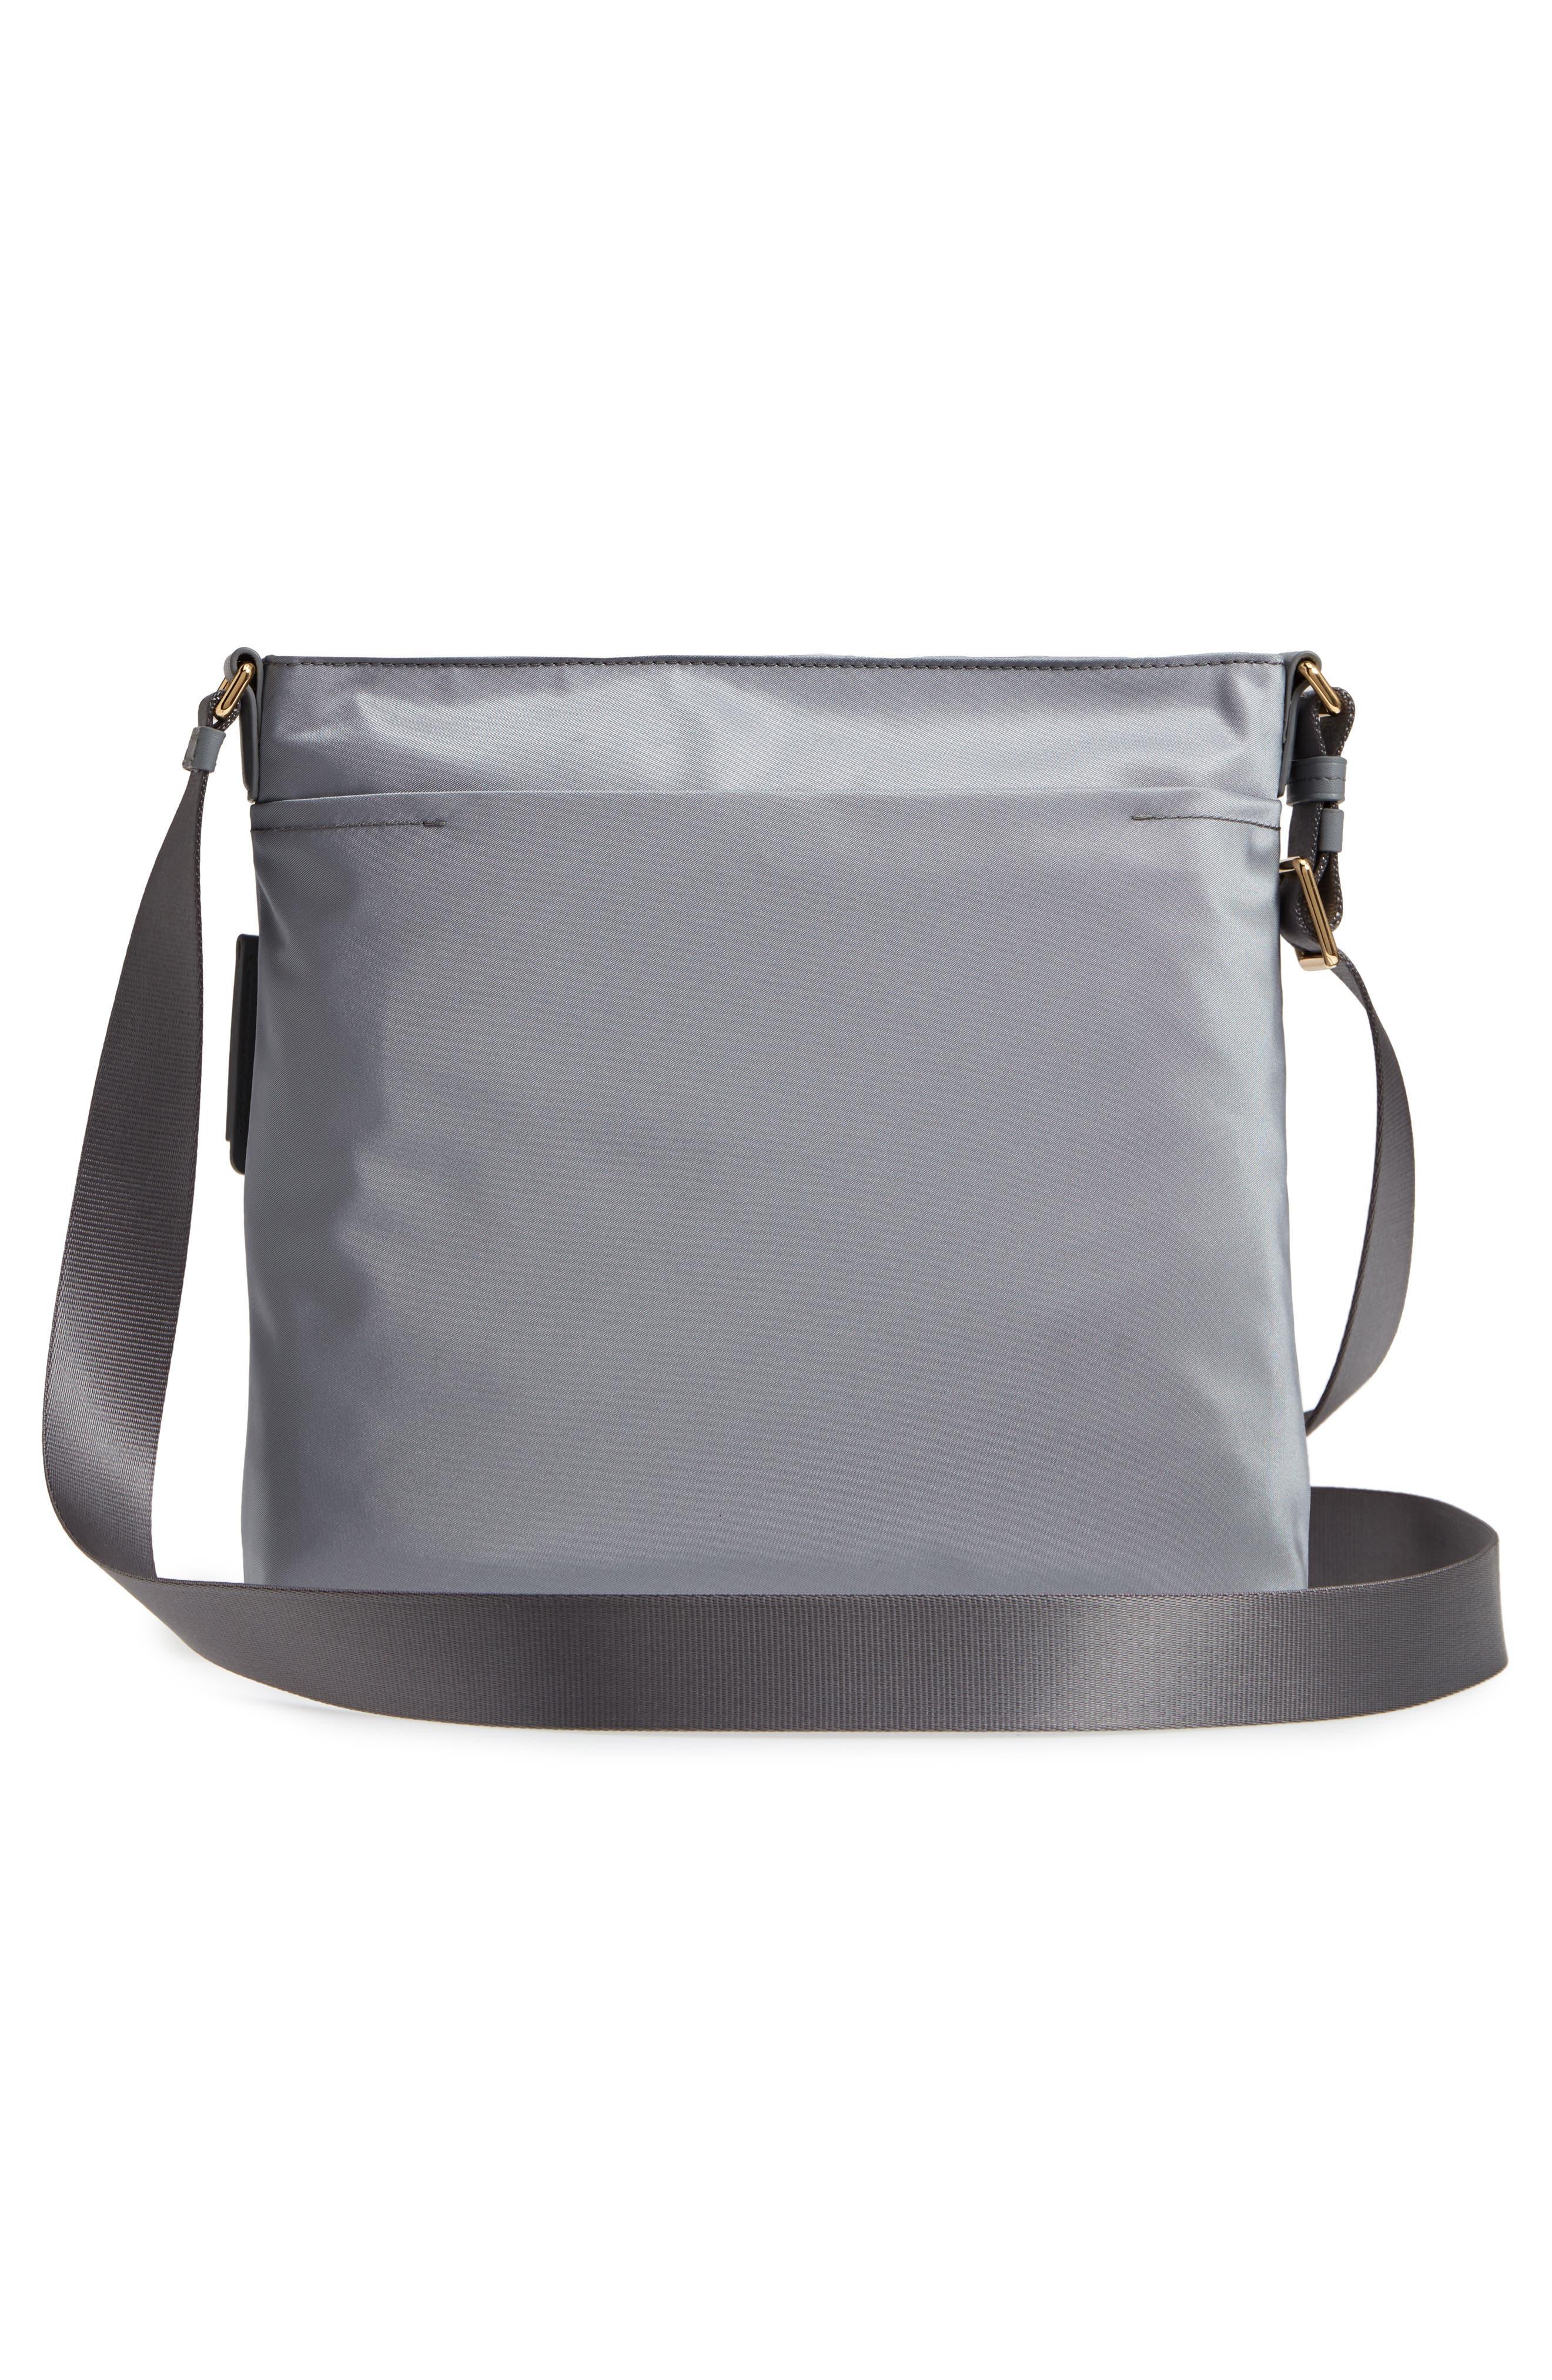 Voyager - Capri Nylon Crossbody Bag,                             Alternate thumbnail 3, color,                             020